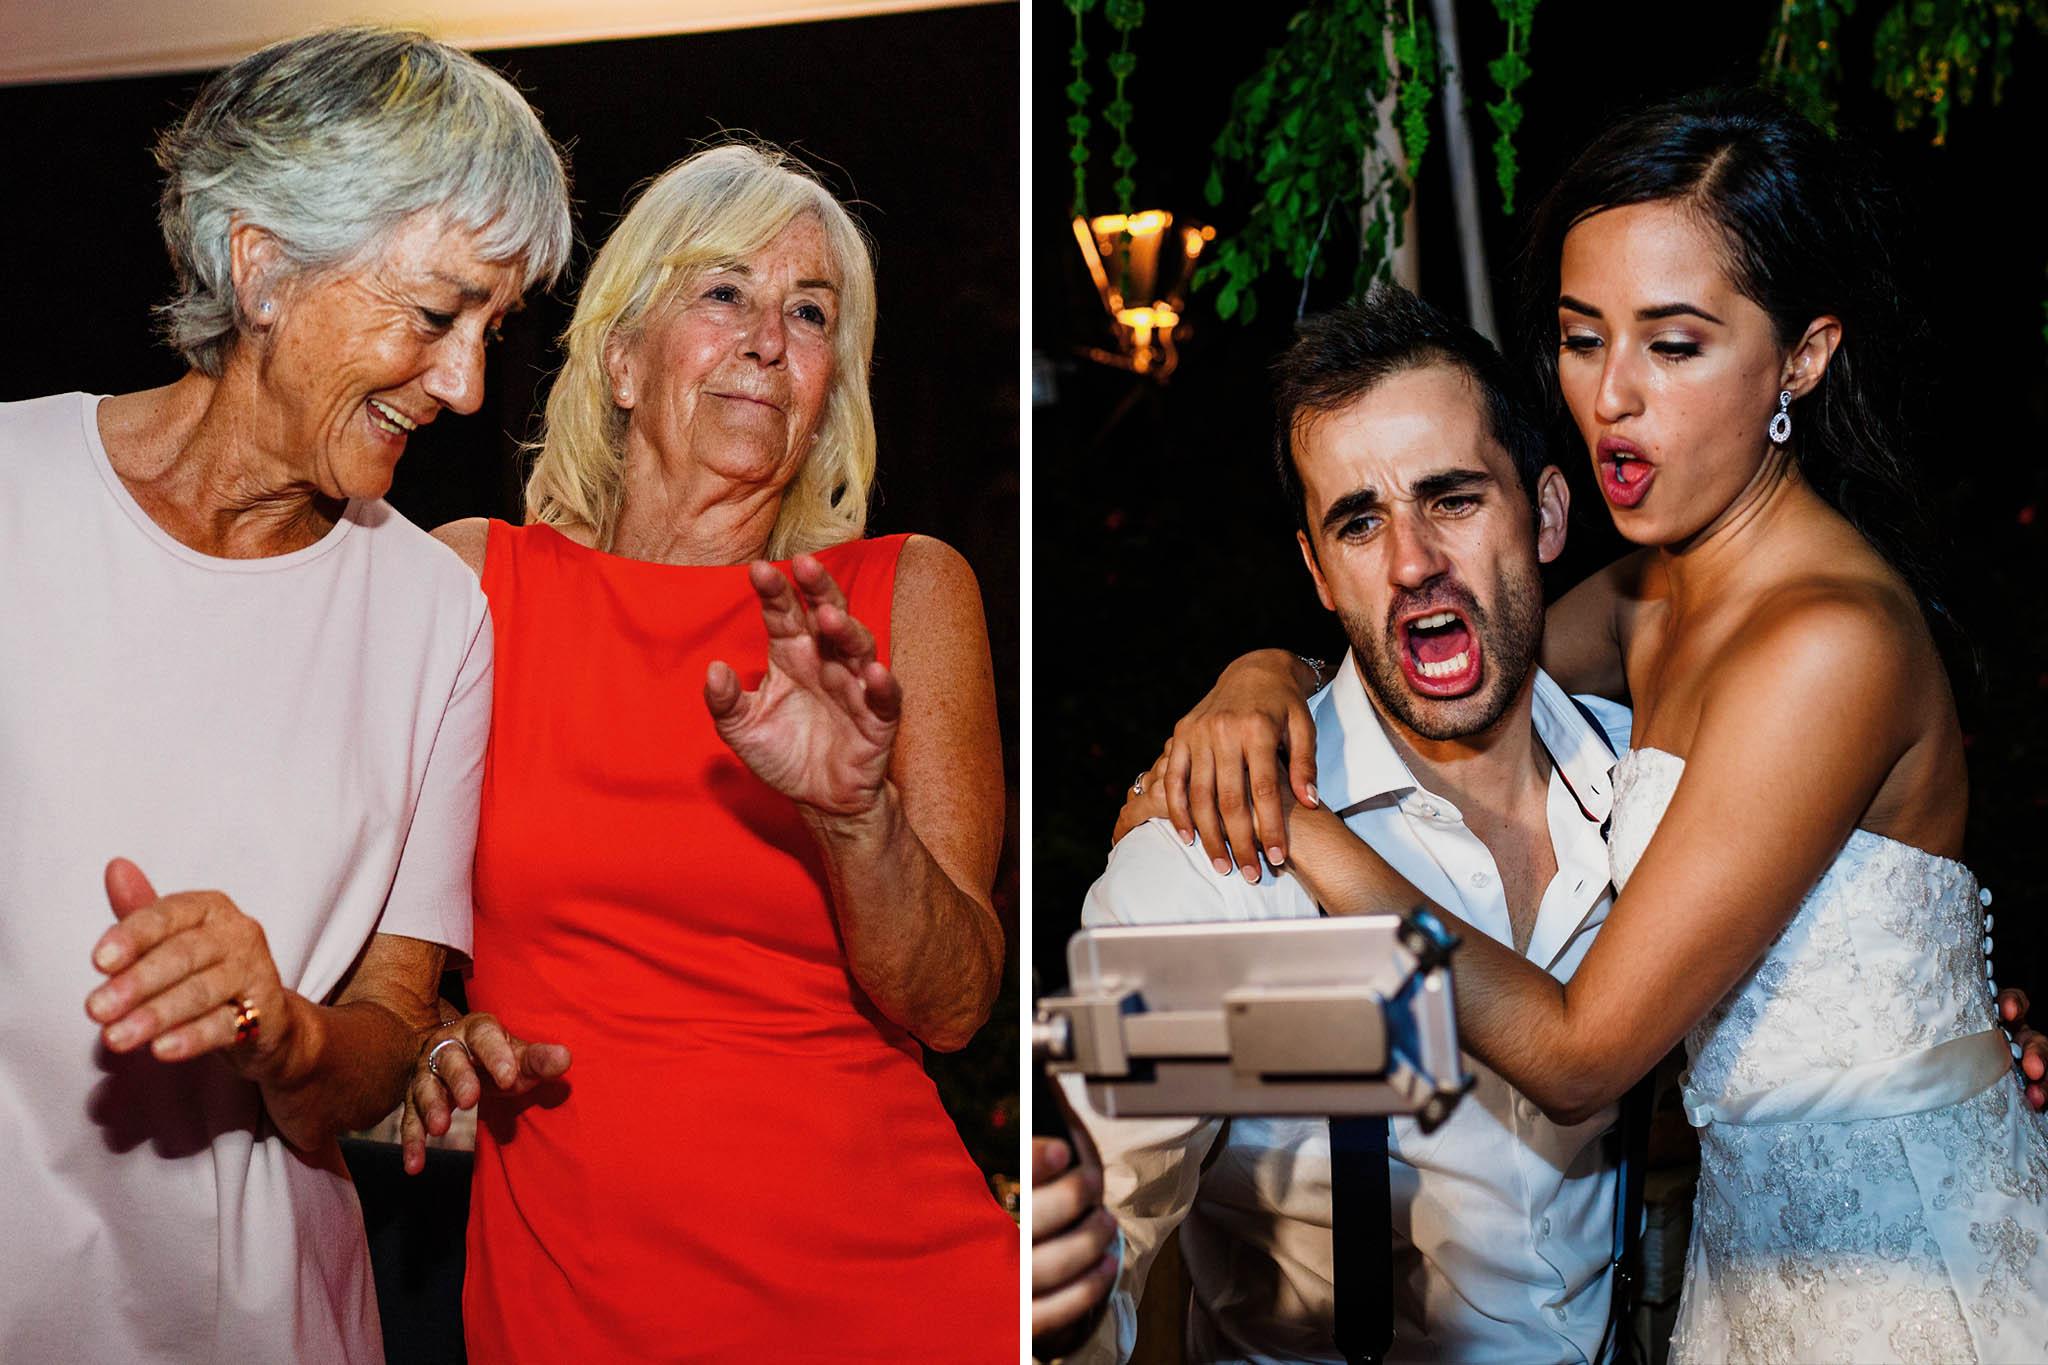 Fotos de fiestas de bodas en Belmond Casa de Sierra Nevada